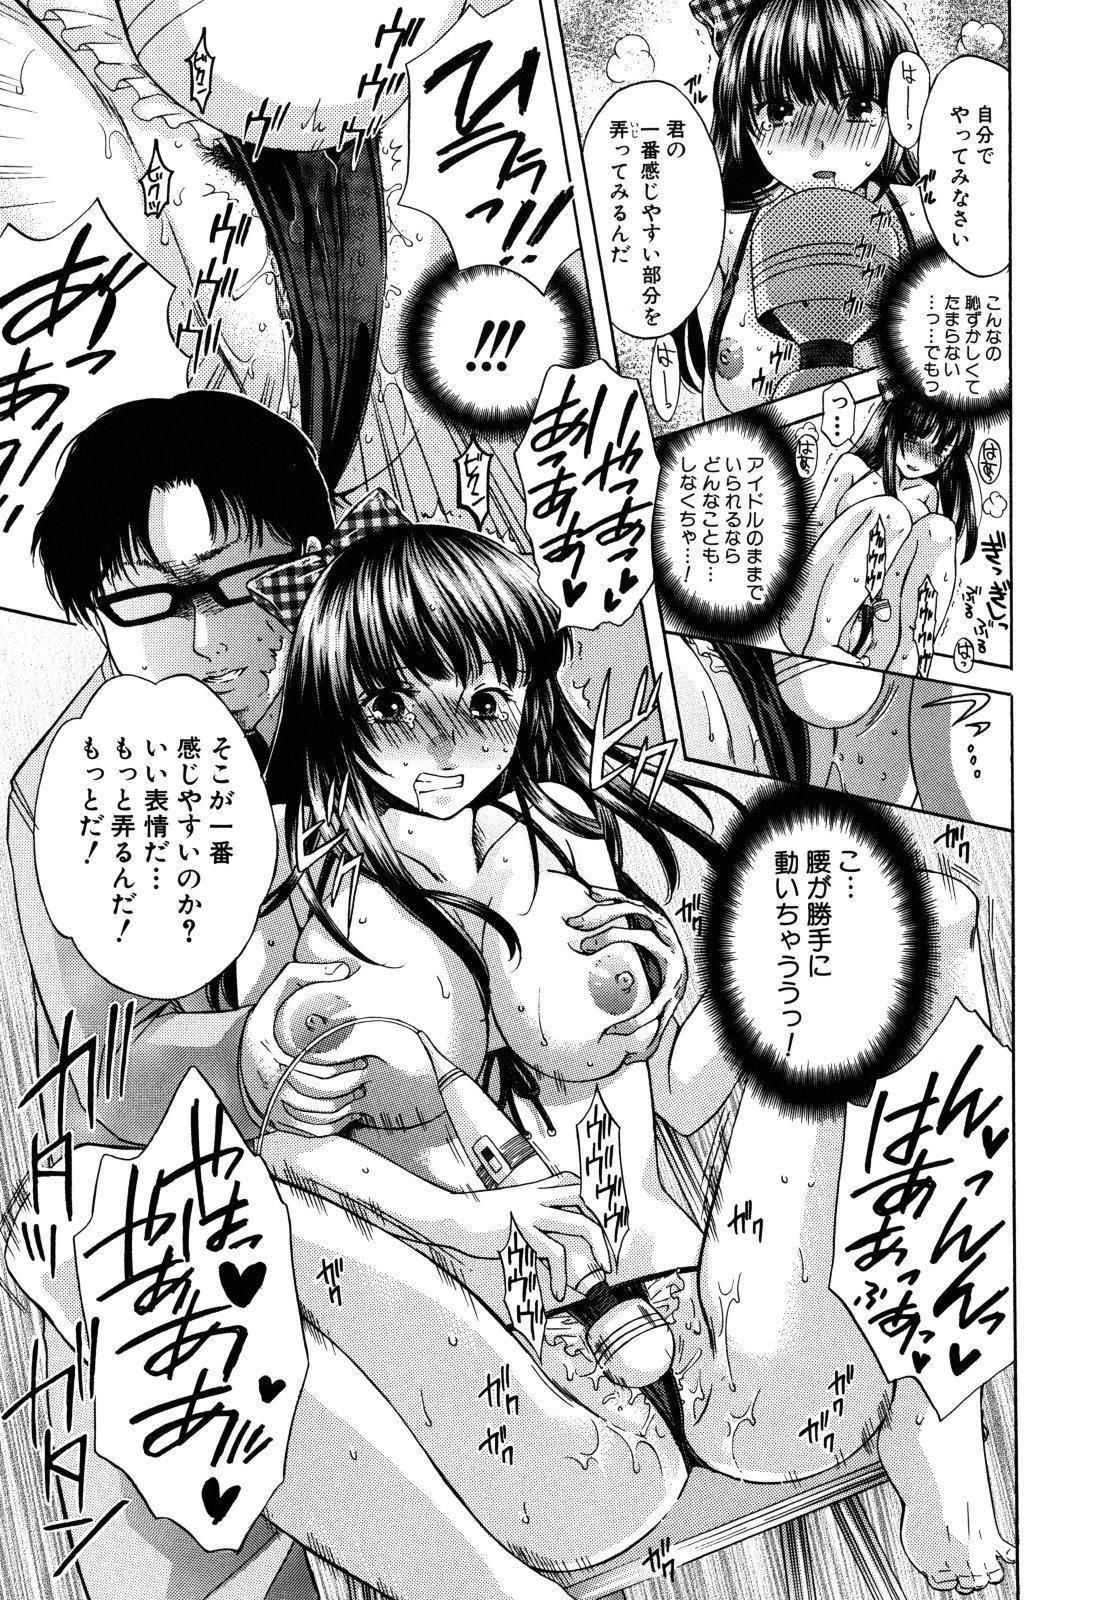 Kanojo ga Ochiru made - She in the depth 34